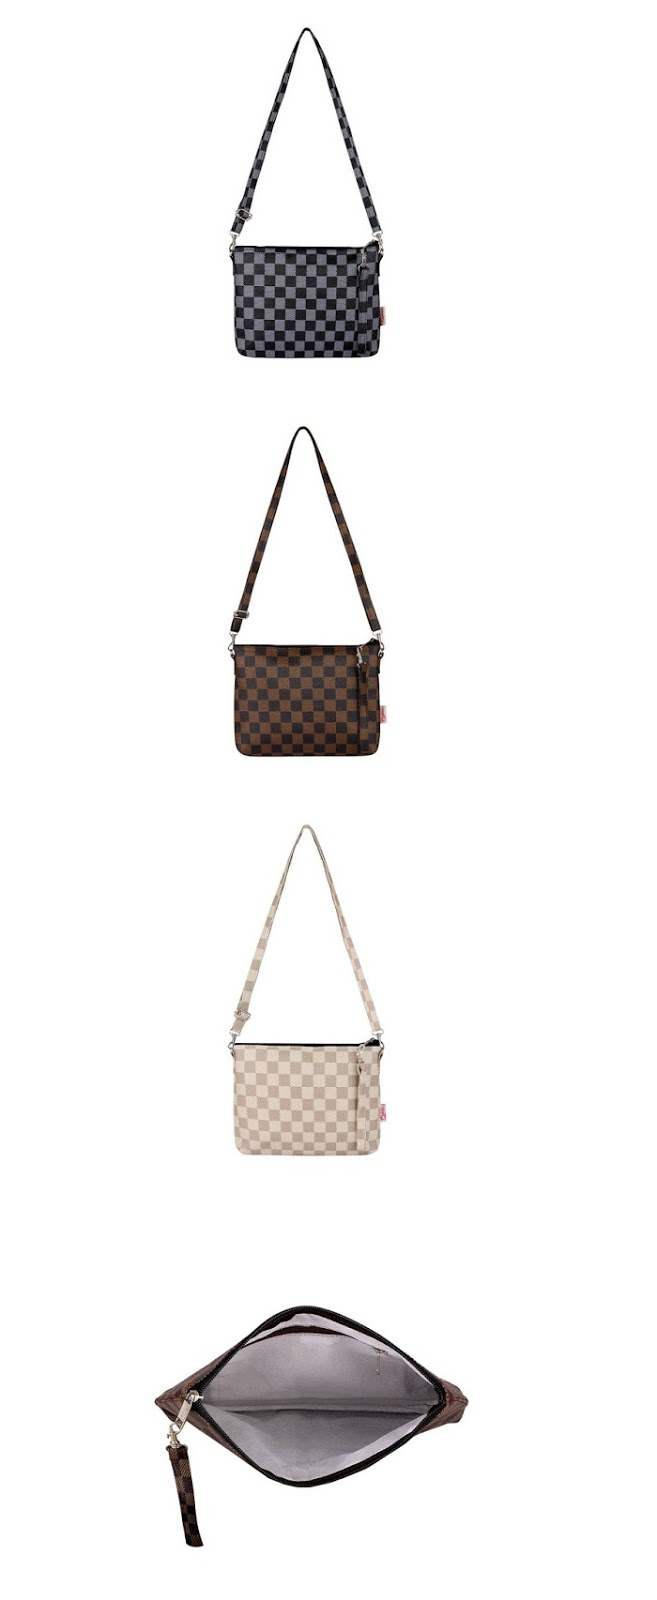 grosir tas sling bag wanita murah, tas sling bag wanita terbaru, tas sling bag wanita lucu